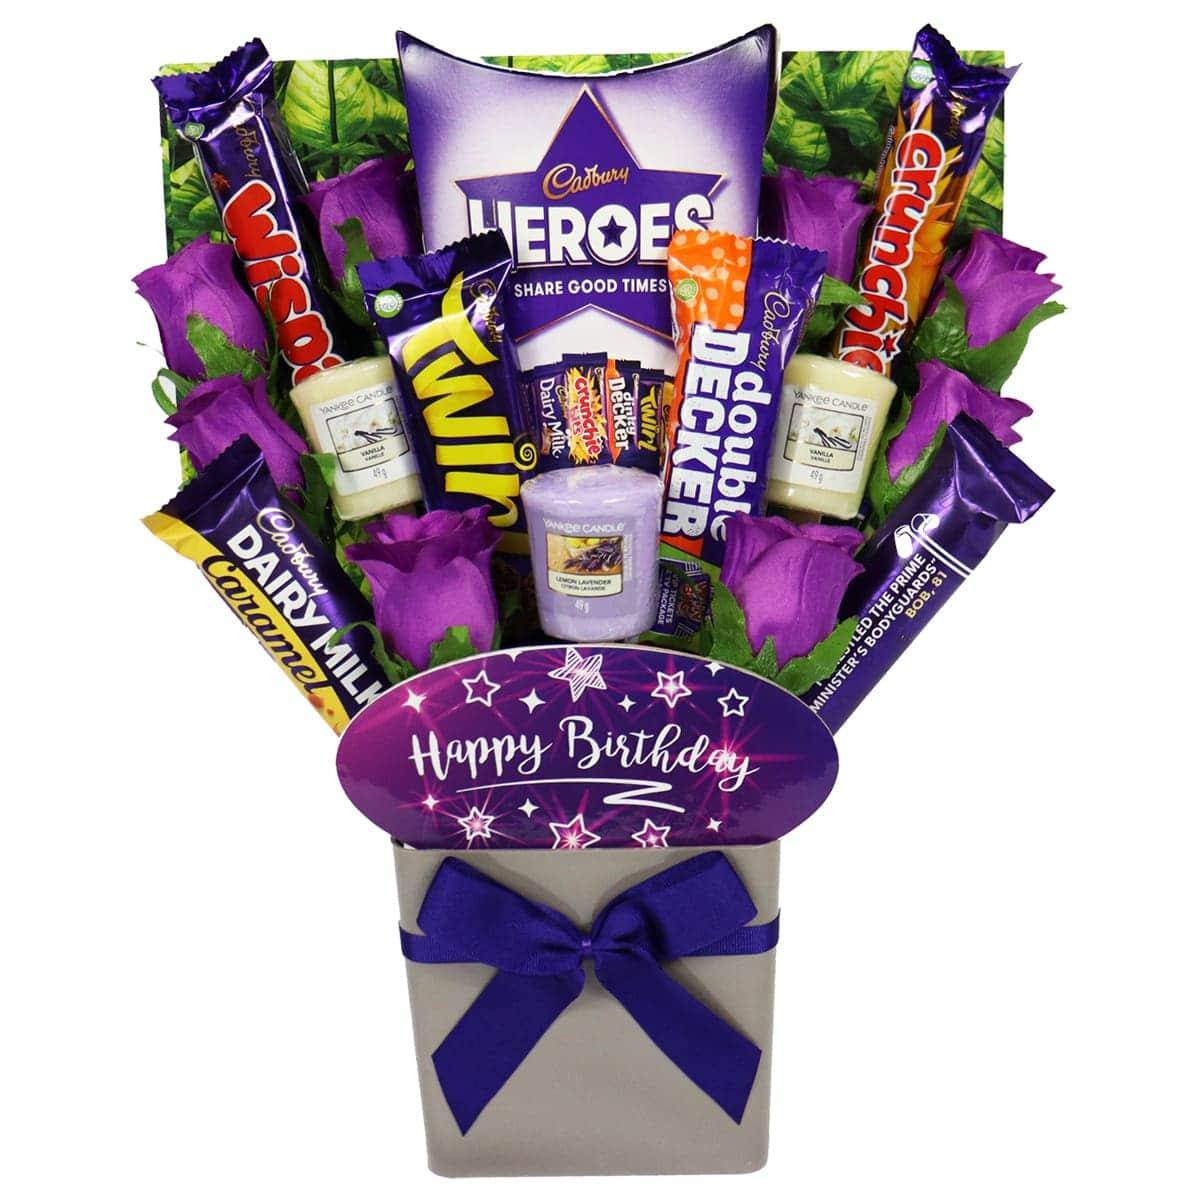 The Happy Birthday Yankee Candle & Cadbury Bouquet